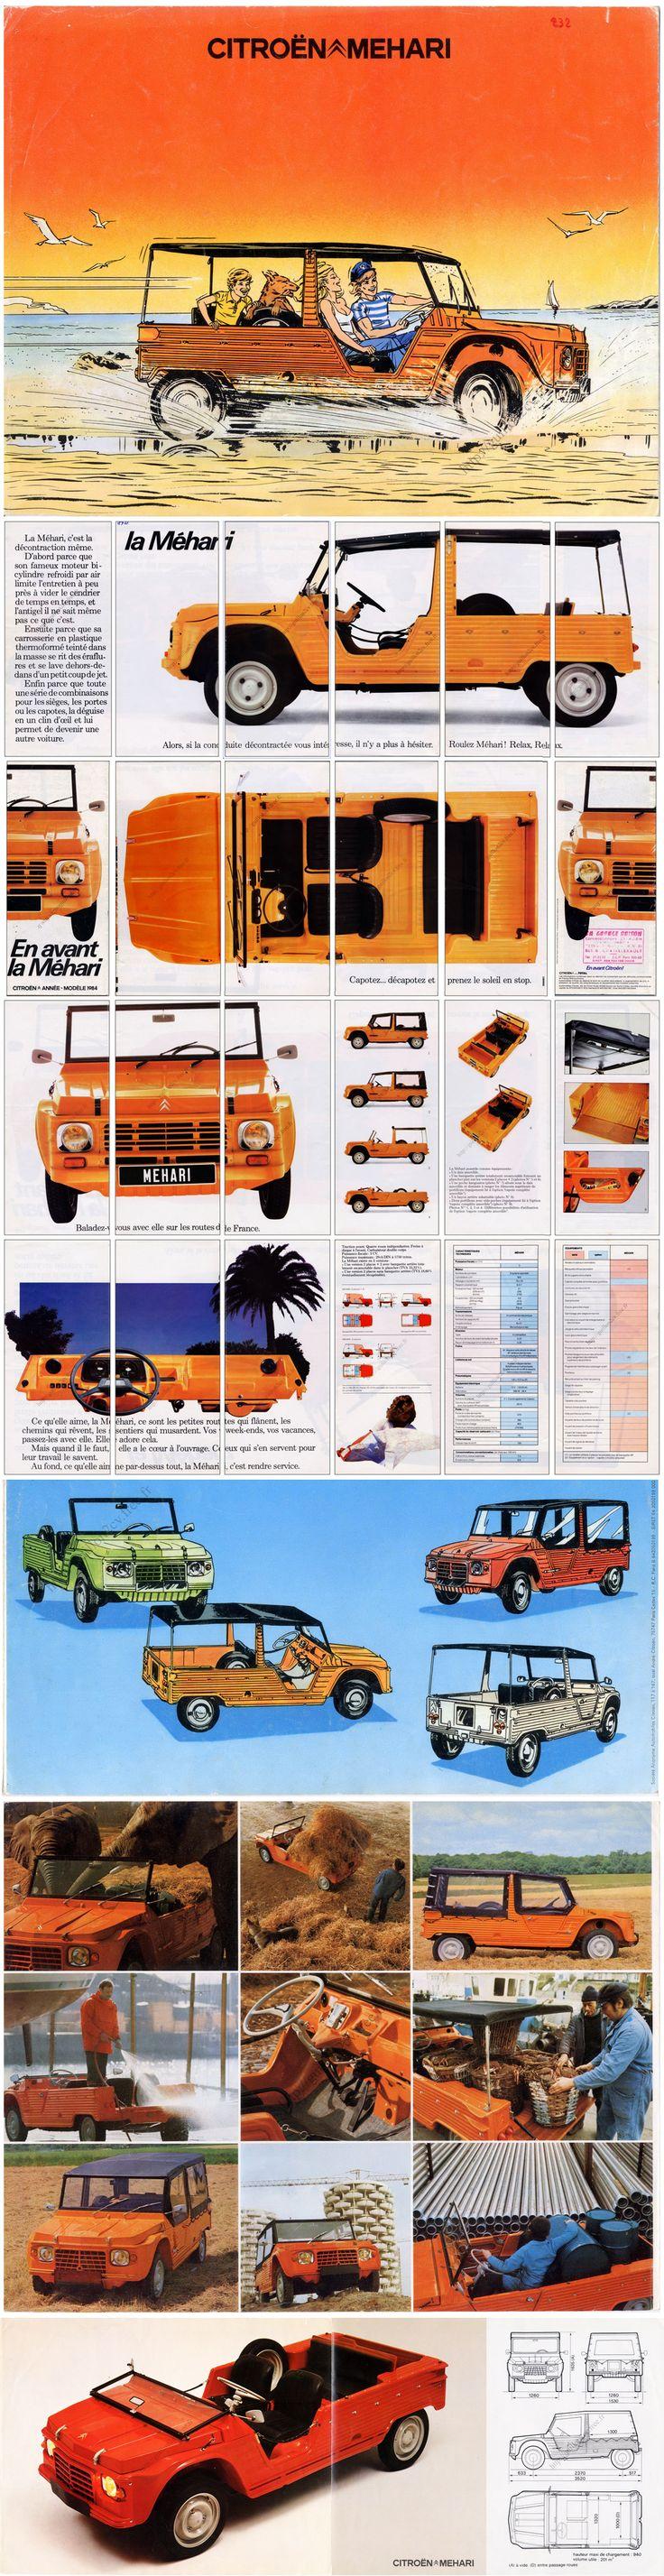 Méhari - Citroën (1968/1987)